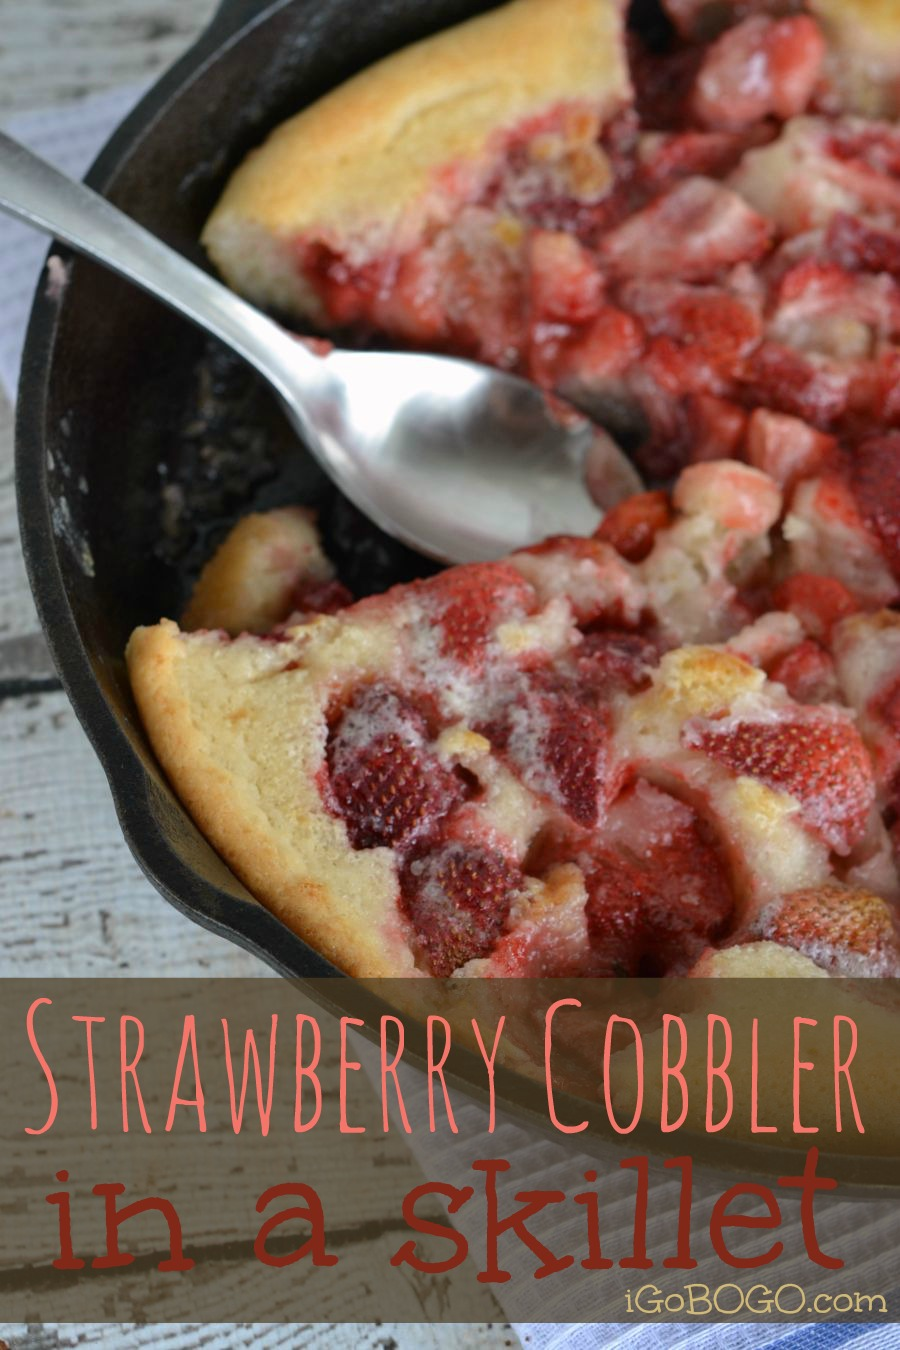 Skillet Strawberry Cobbler